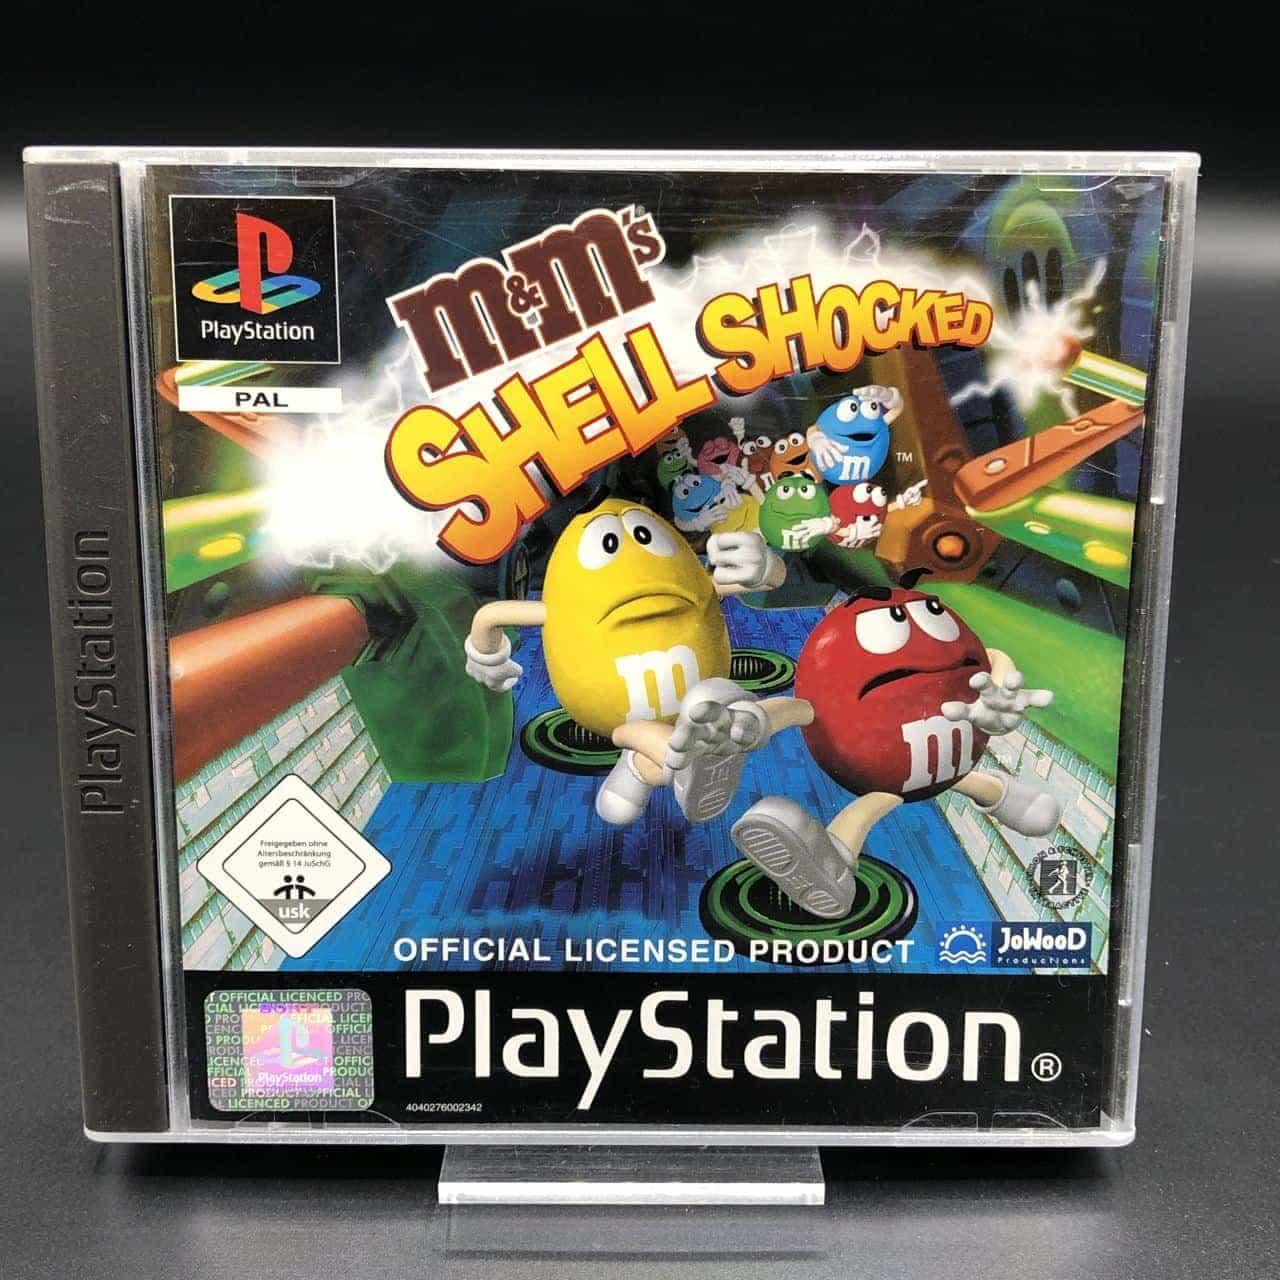 PS1 M&Ms Shell Shocked (Komplett) (Sehr gut) Sony PlayStation 1